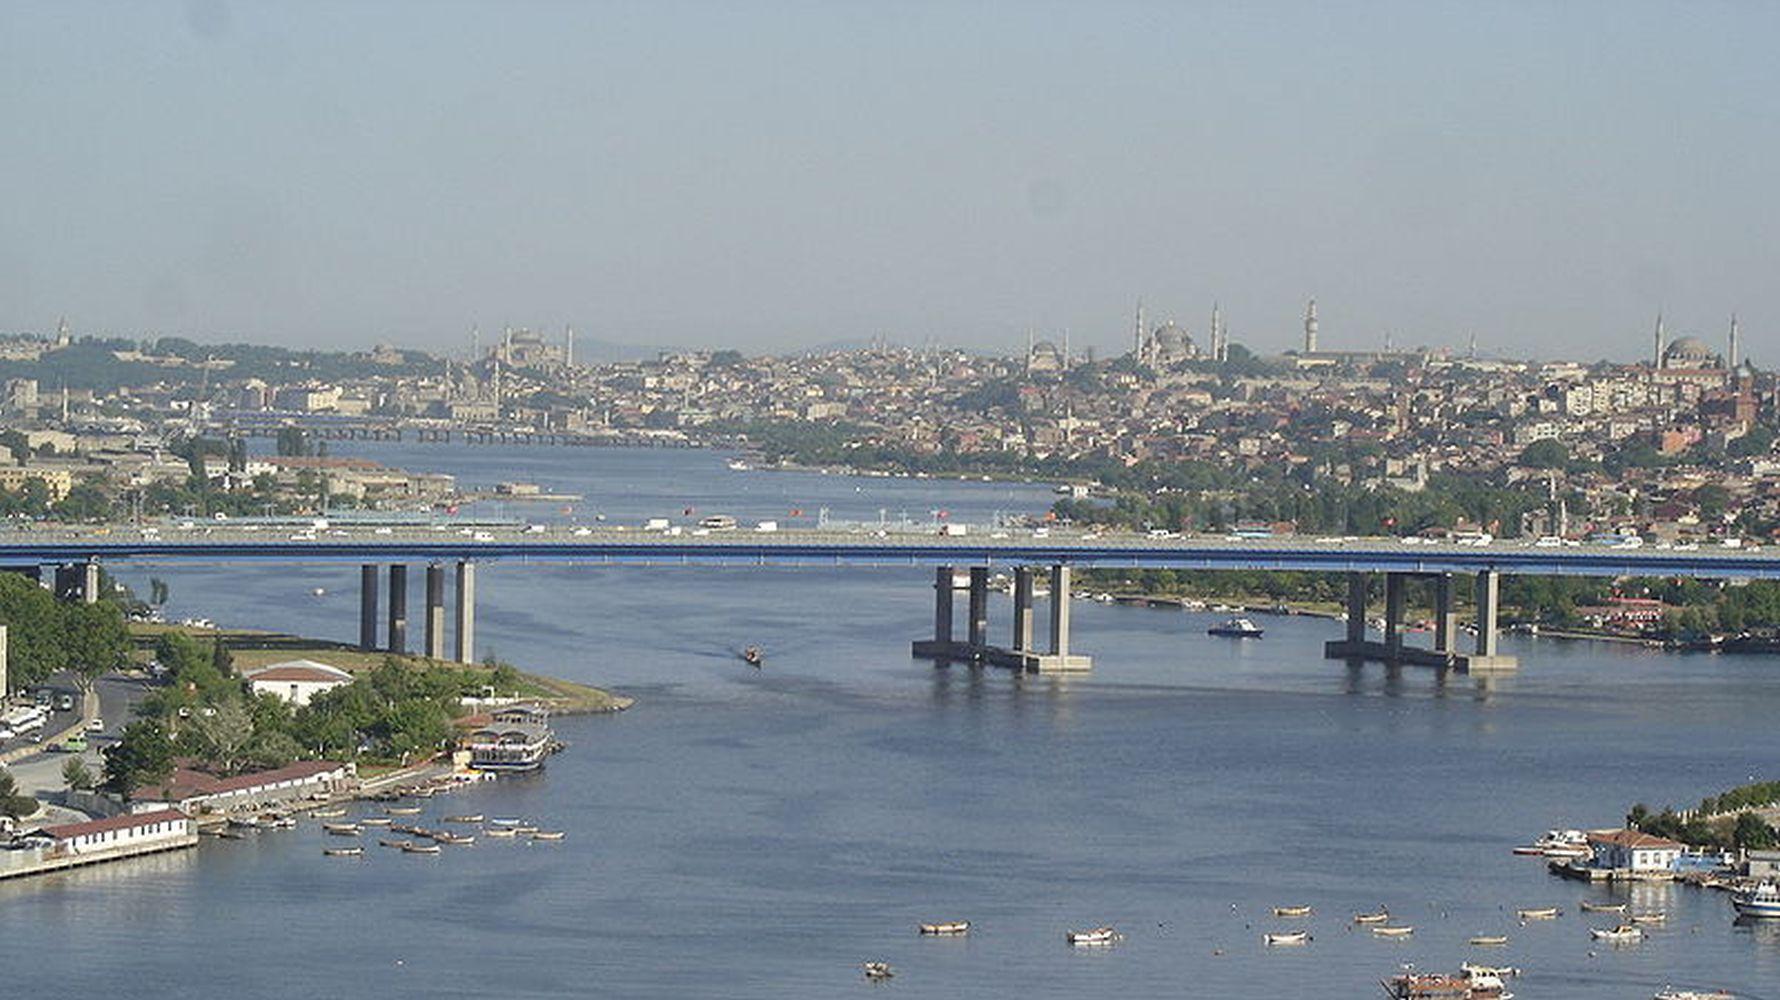 where is the estuary bridge